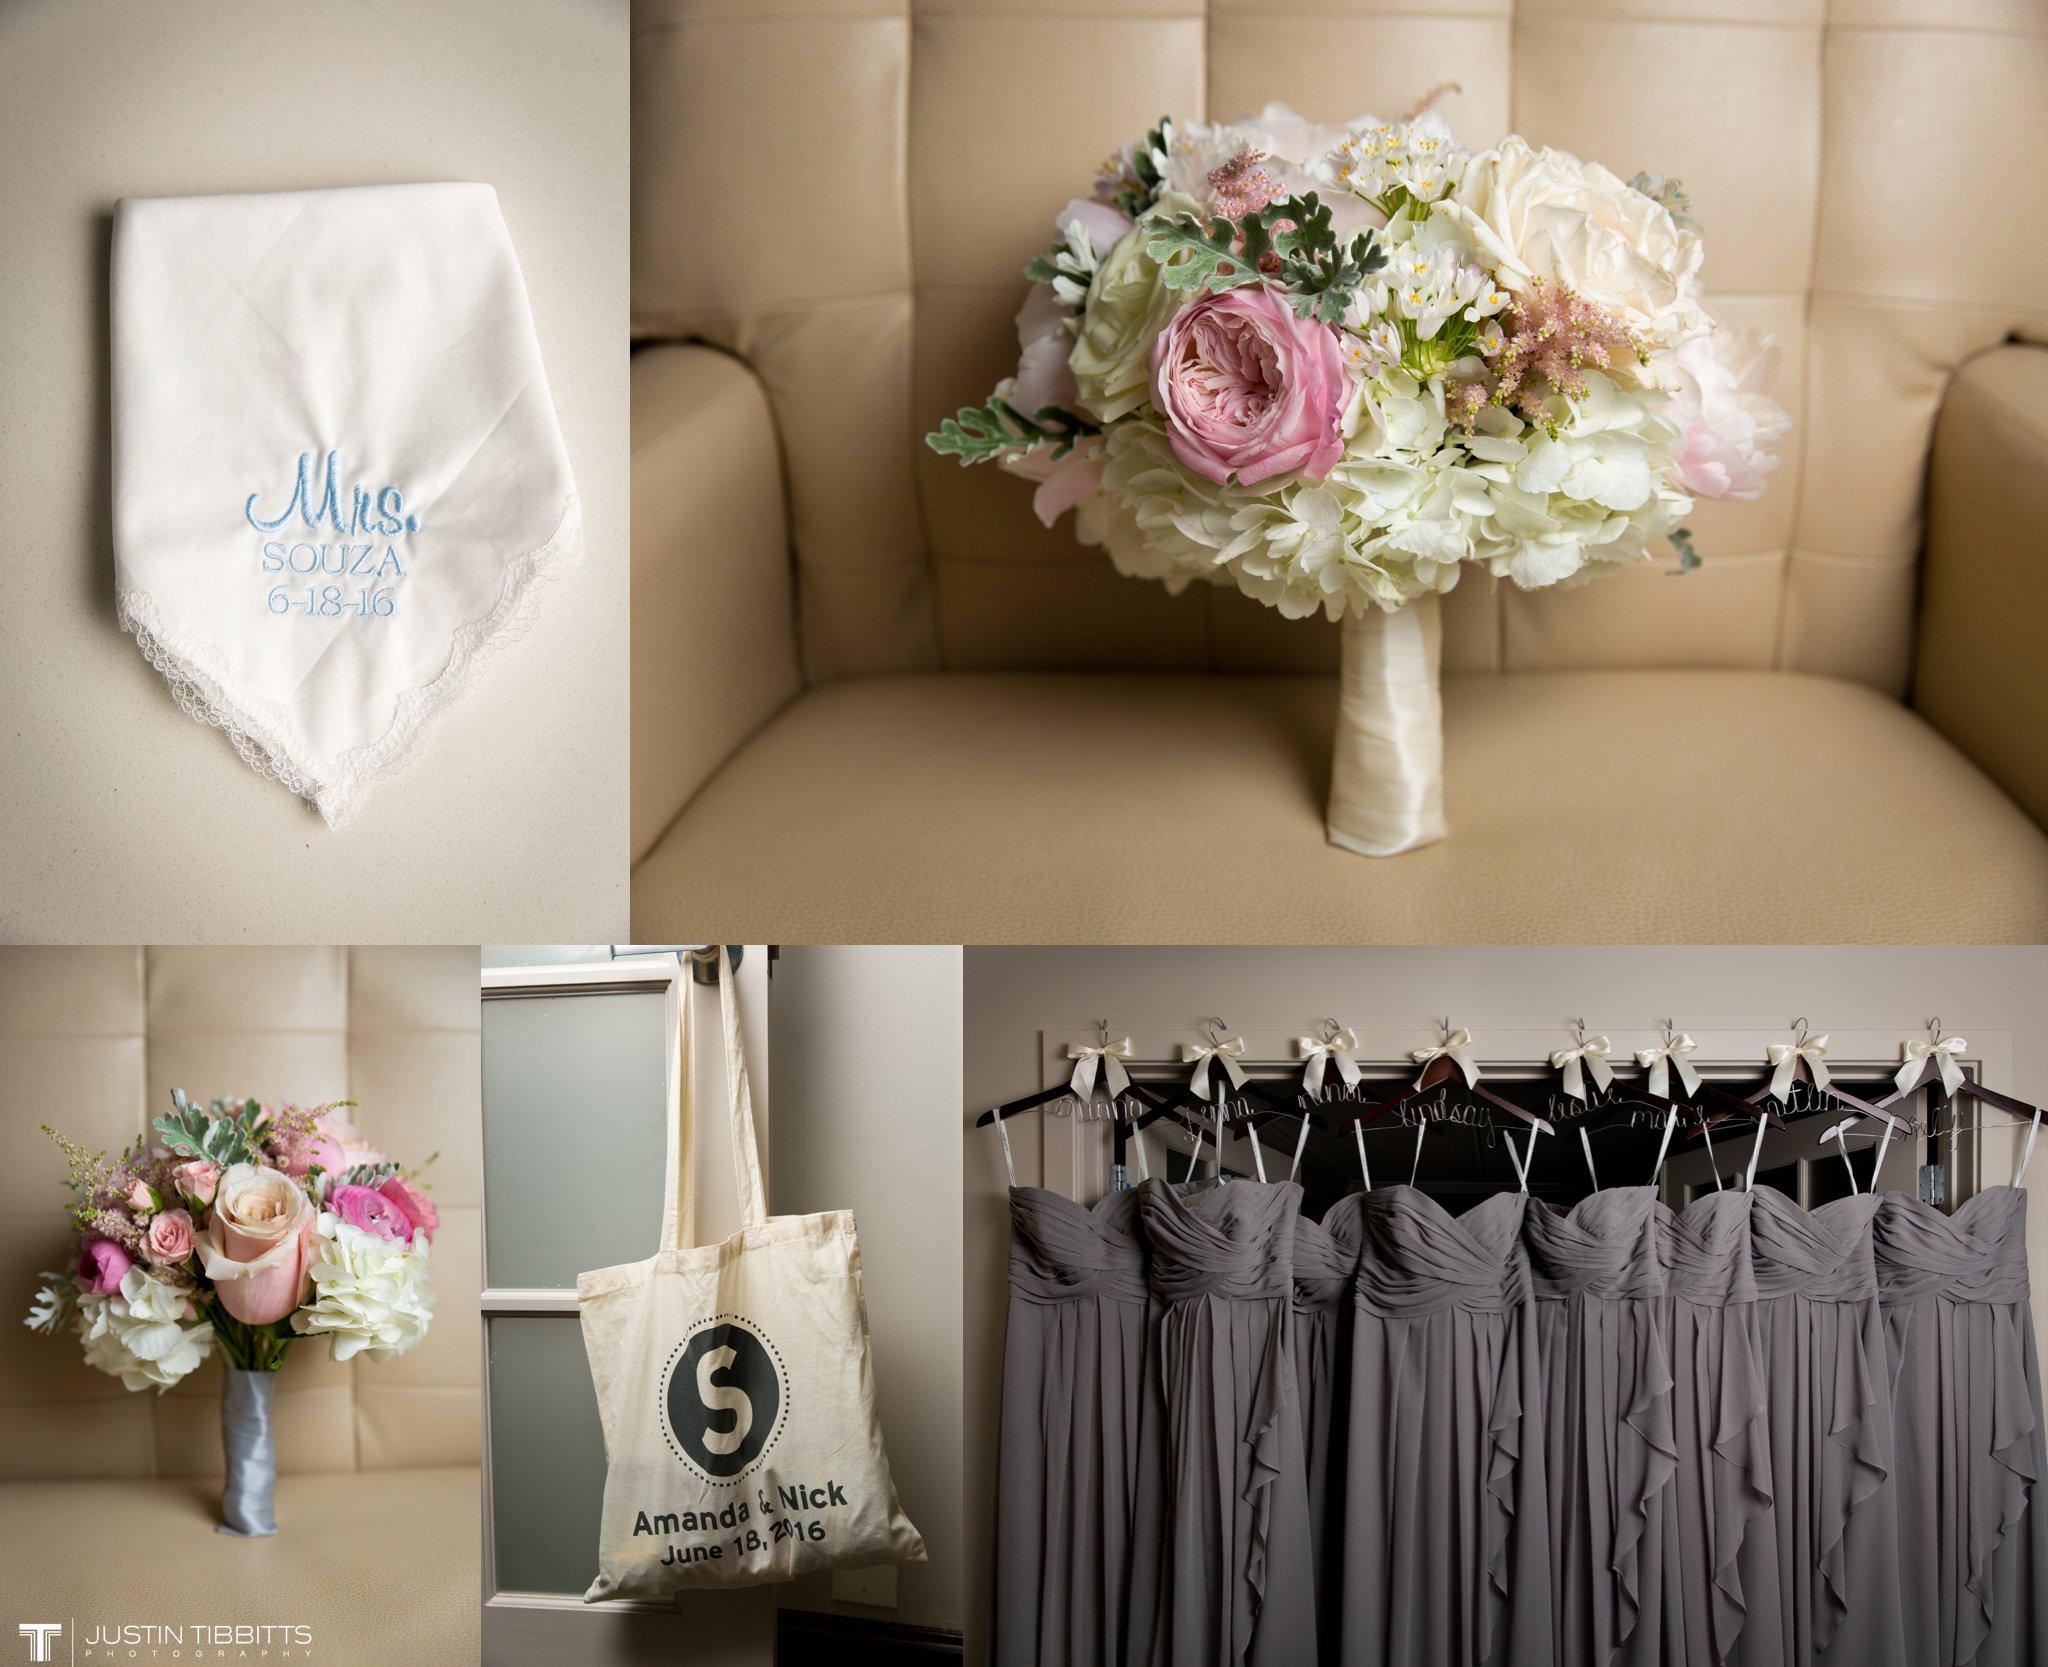 state-room-wedding-photos-with-amanda-and-nick_0003